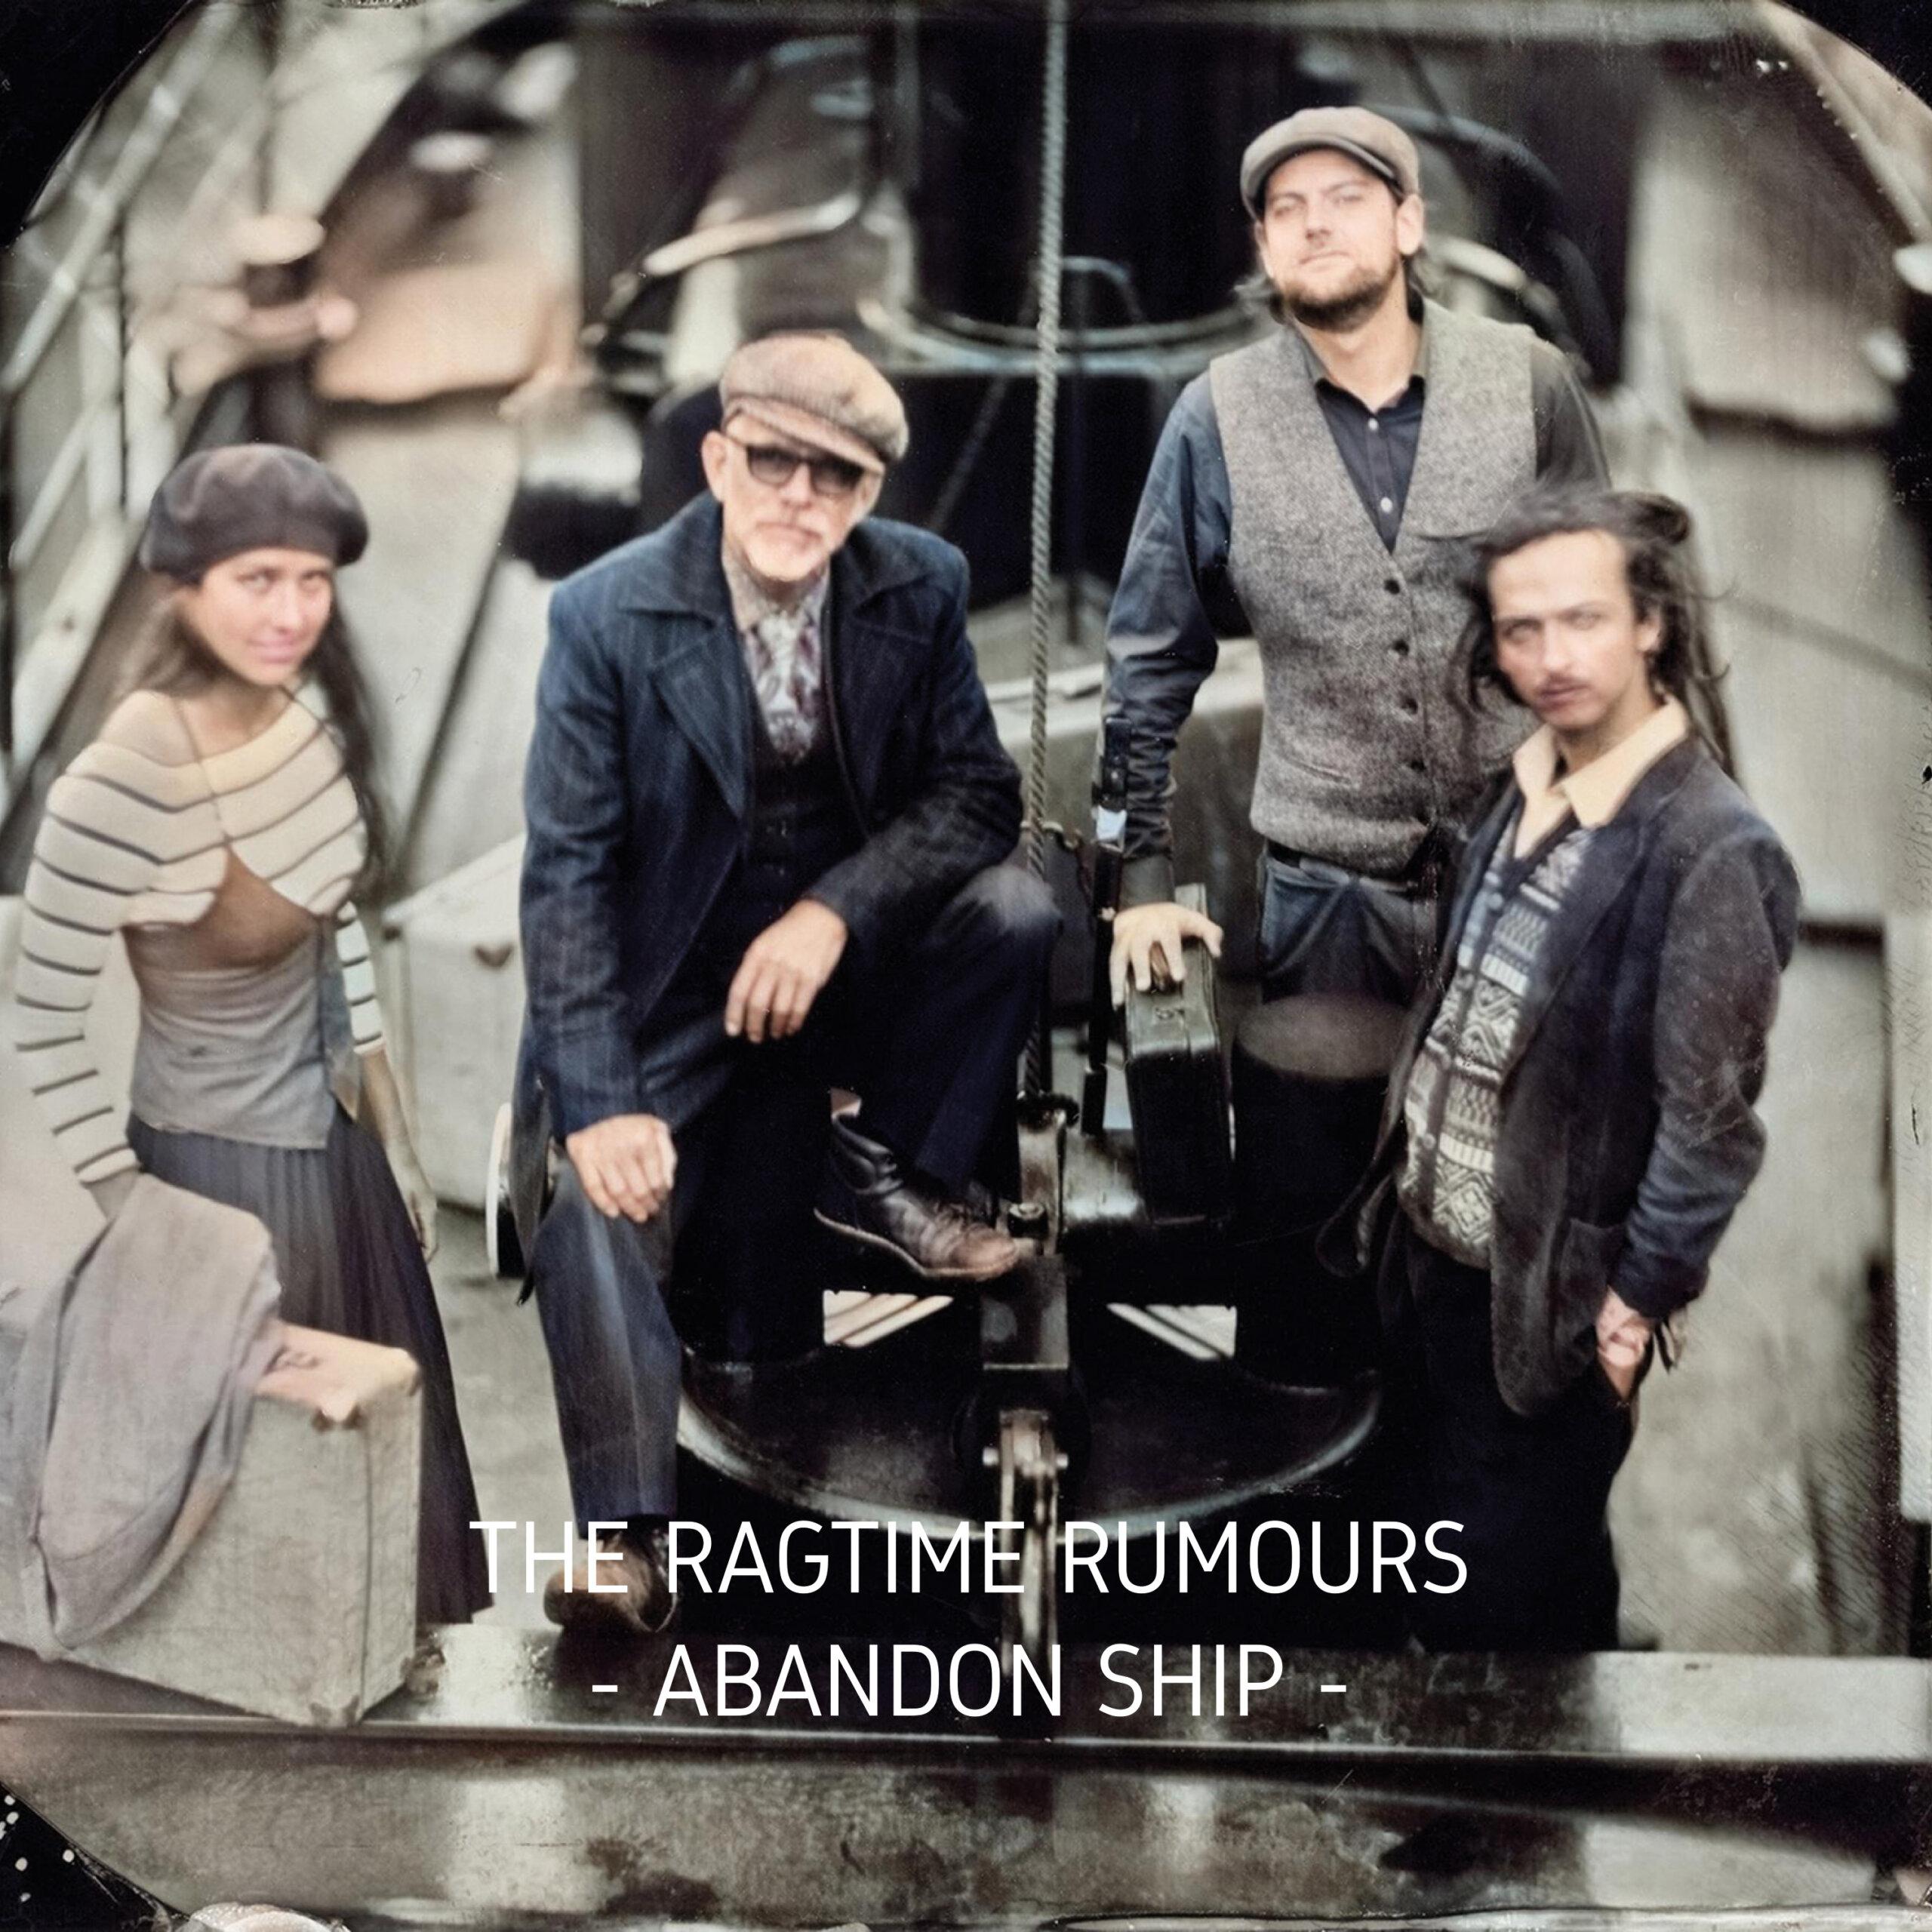 The Ragtime Rumours - Abandon Ship